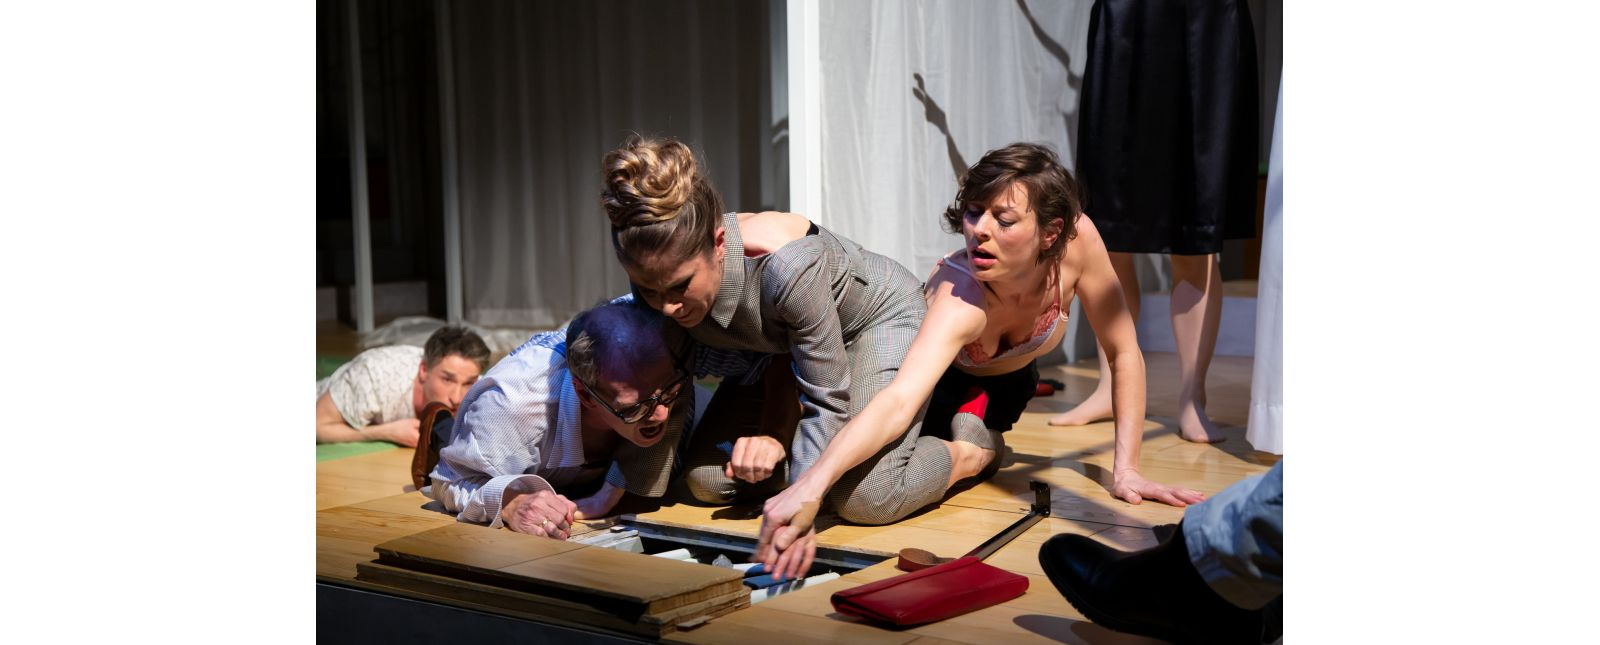 Der Würgeengel // Tim Al-Windawe / Michael Witte / Angela Falkenhan / Stefanie Mrachacz // 2020 // Laura Nickel